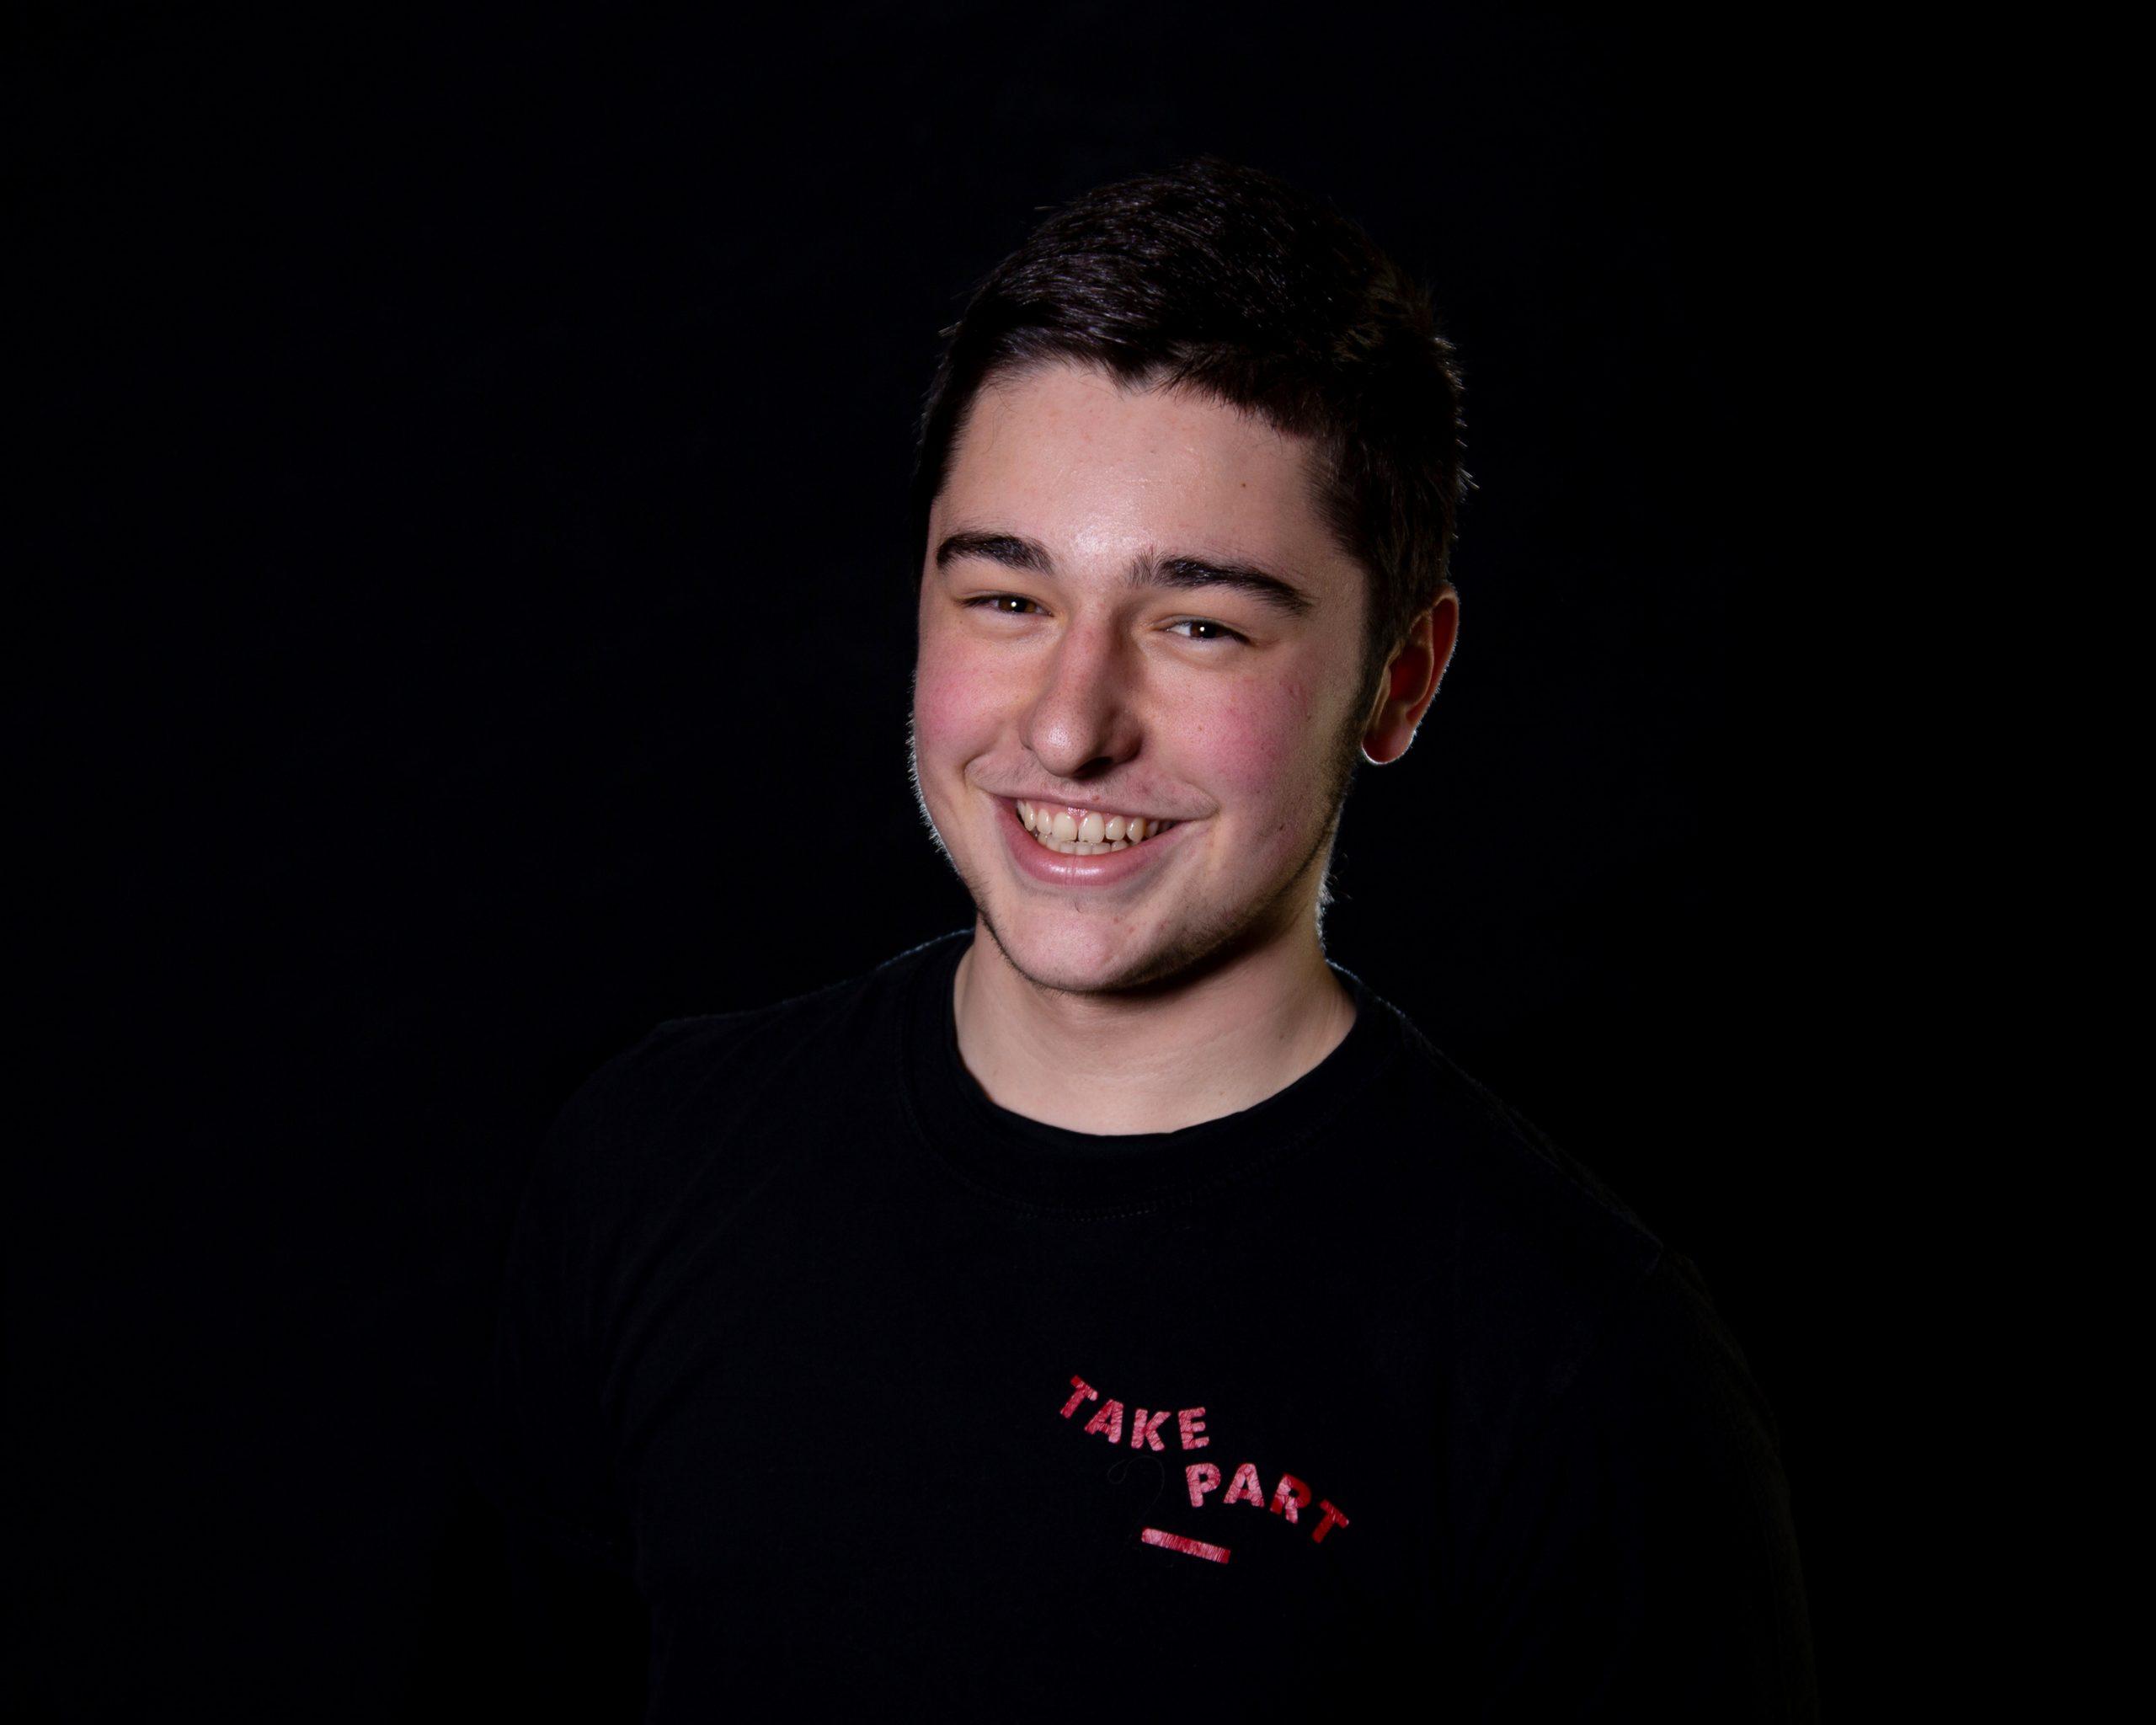 Headshot of Olly Williams